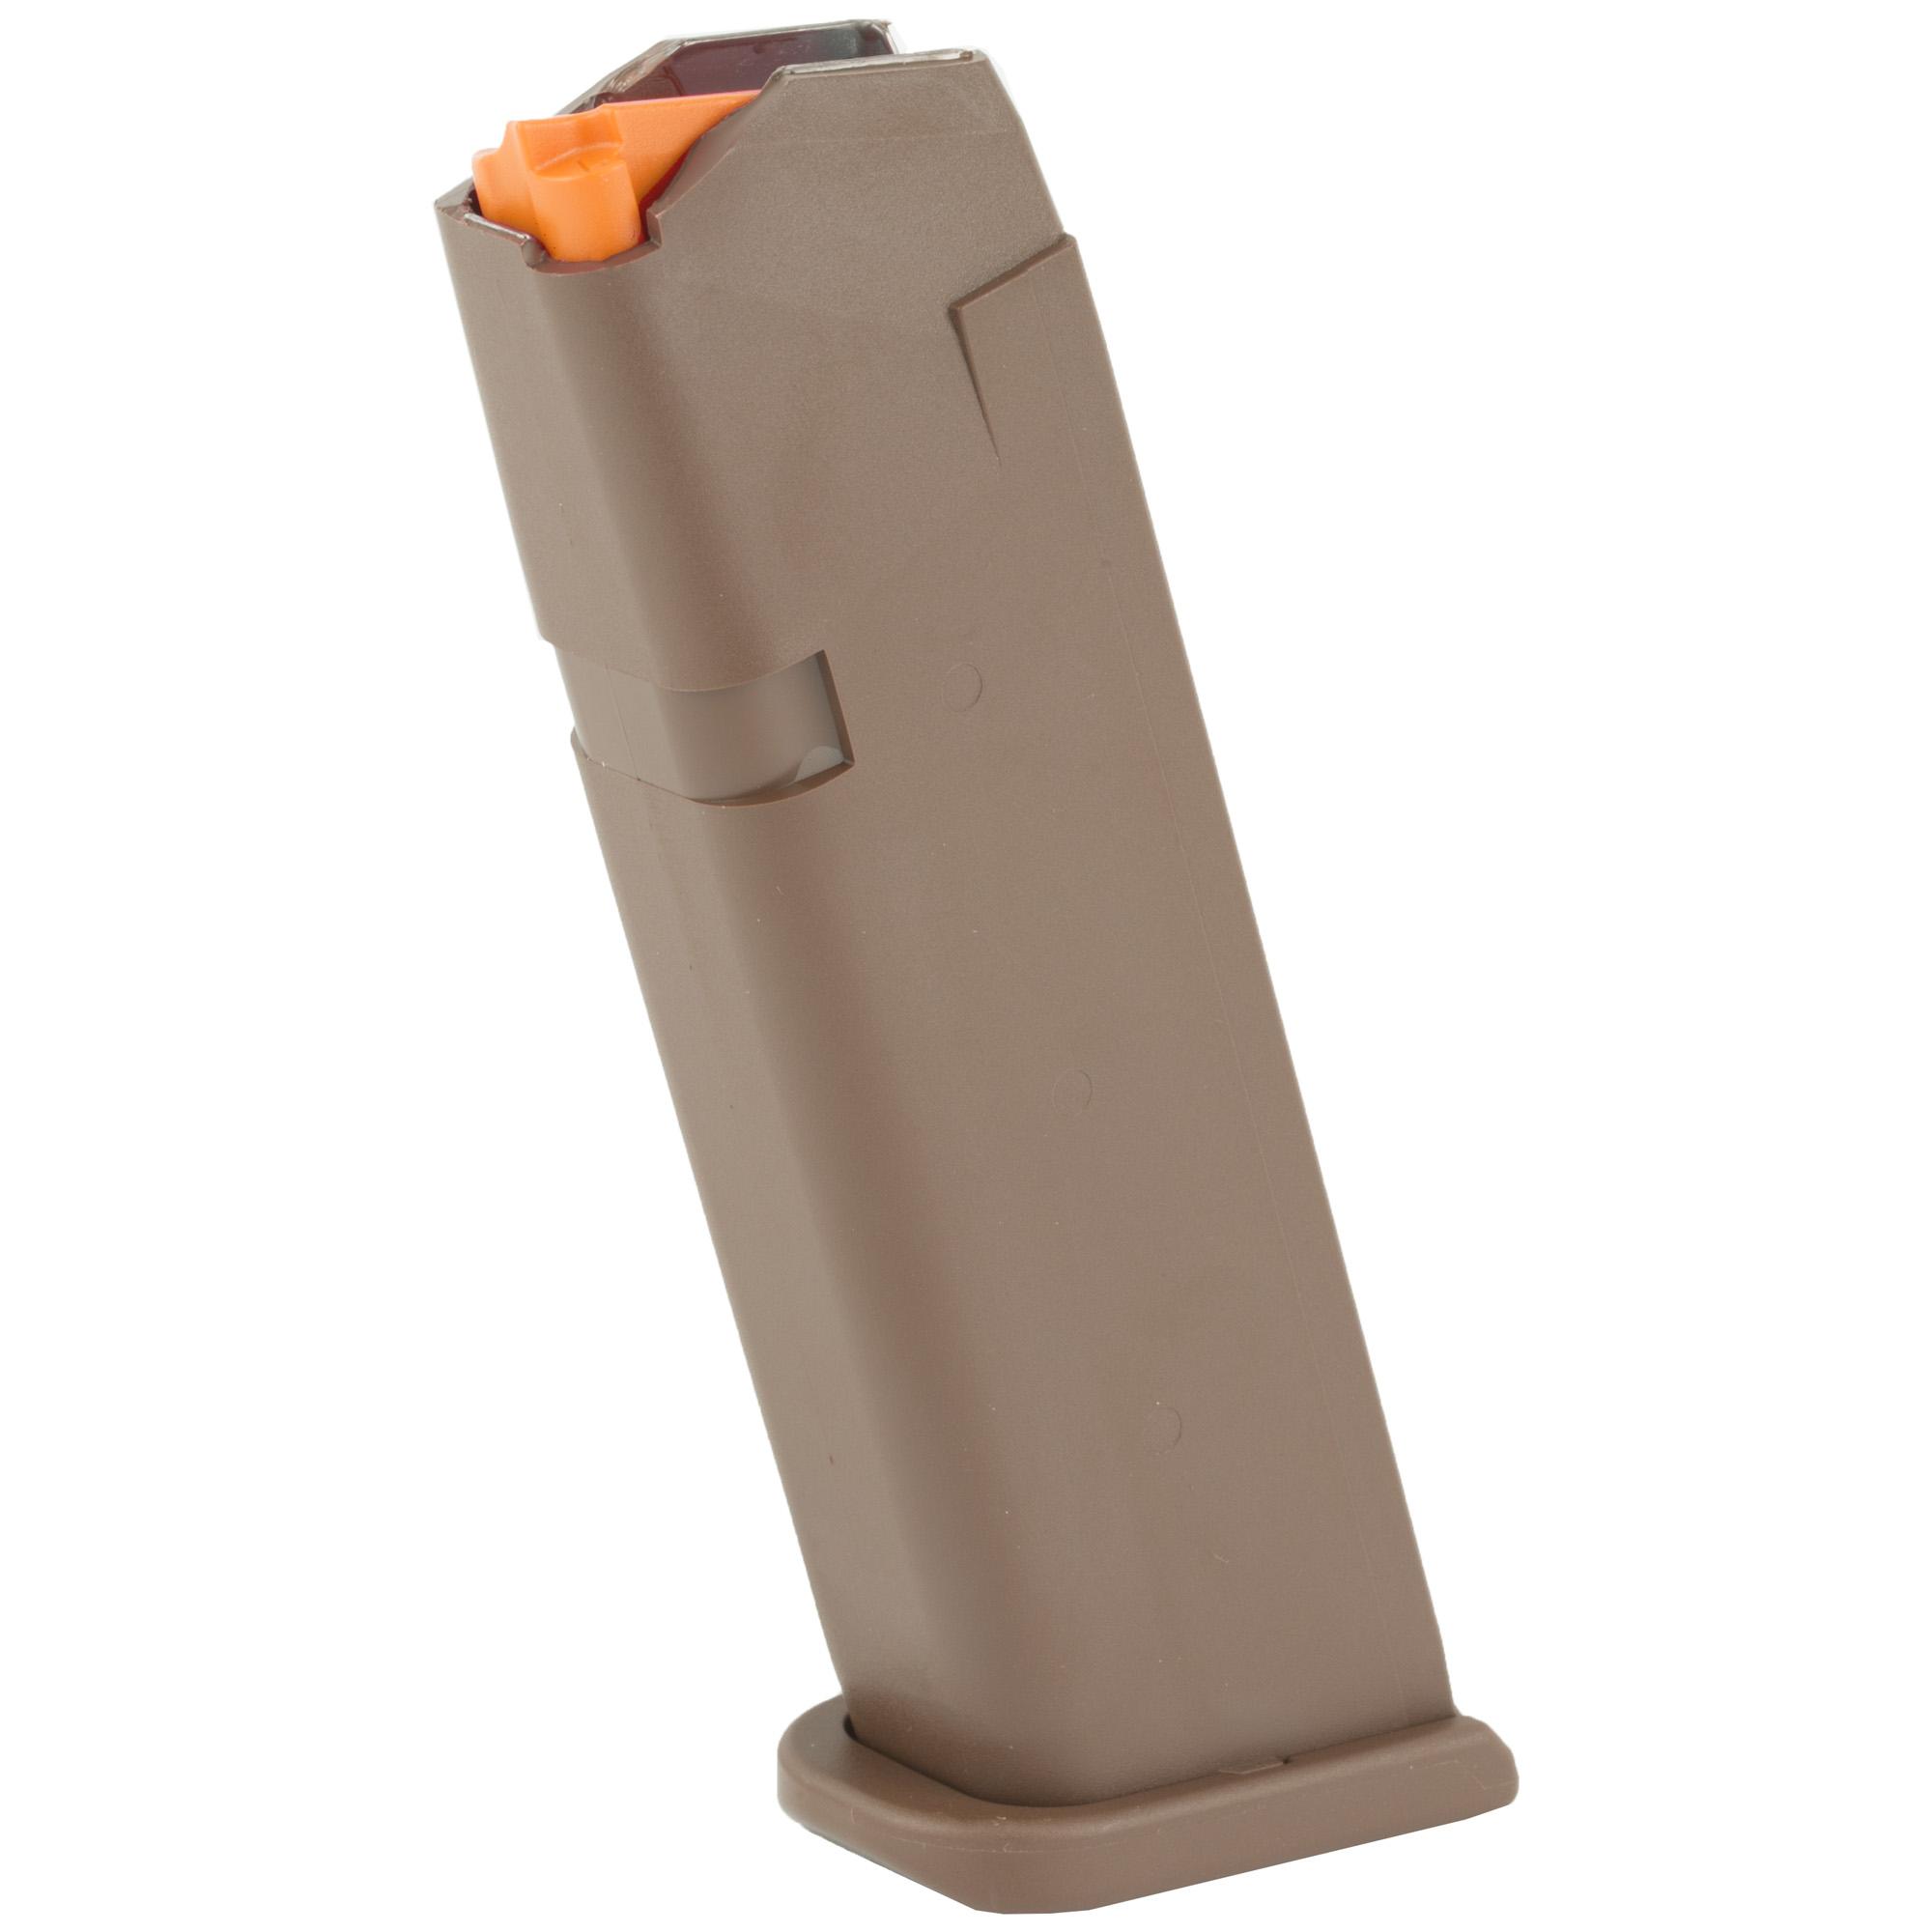 Glock 17 9mm 17RD Magazine - FDE